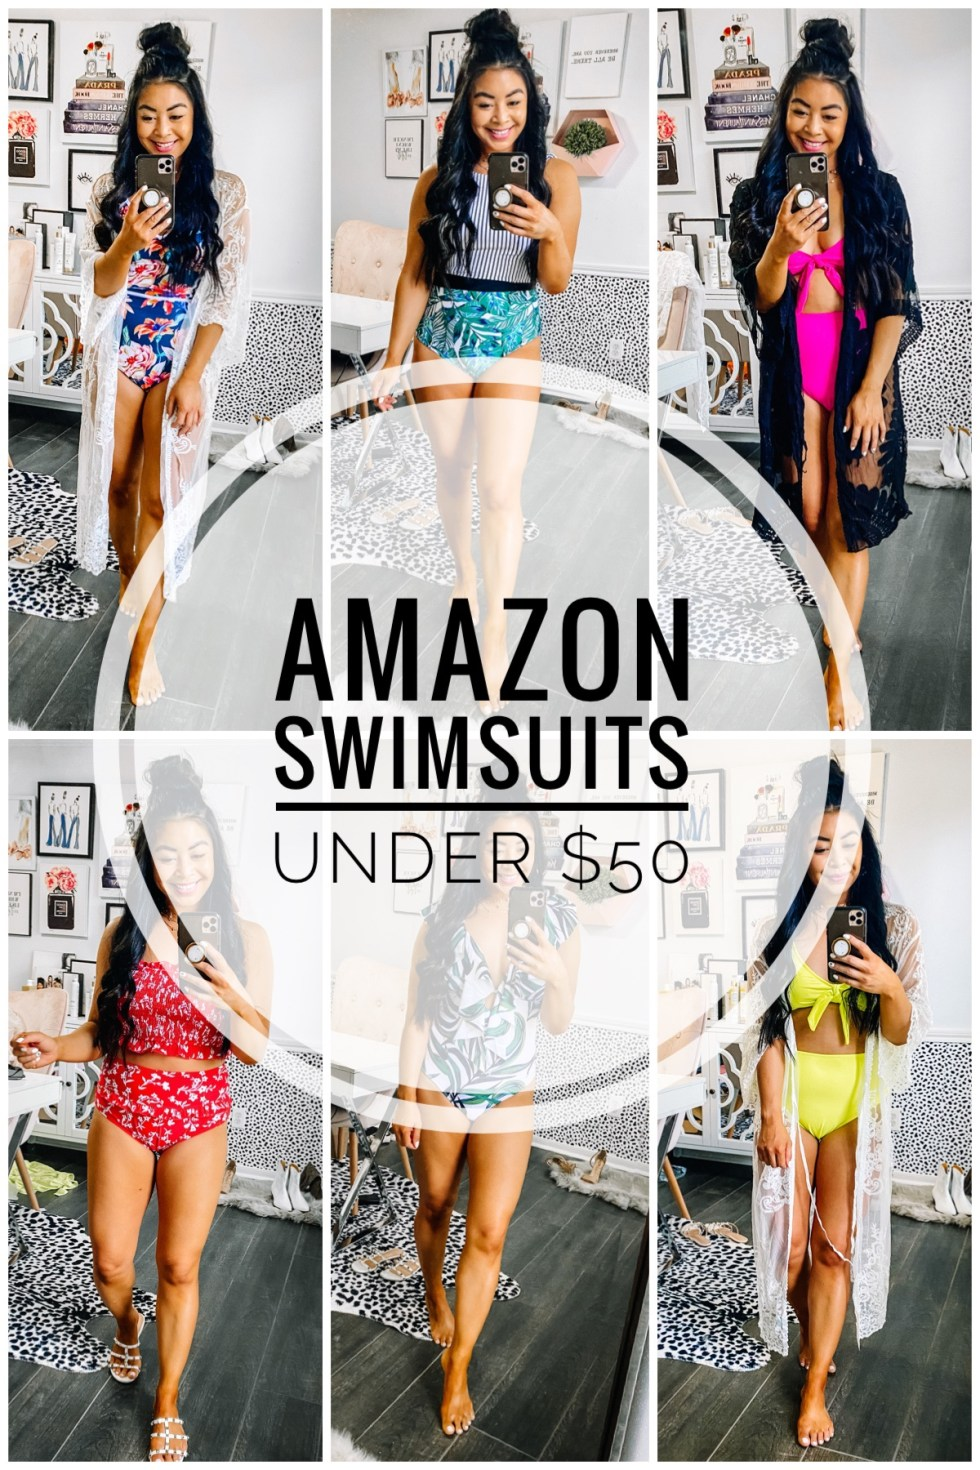 amazon-swimsuits